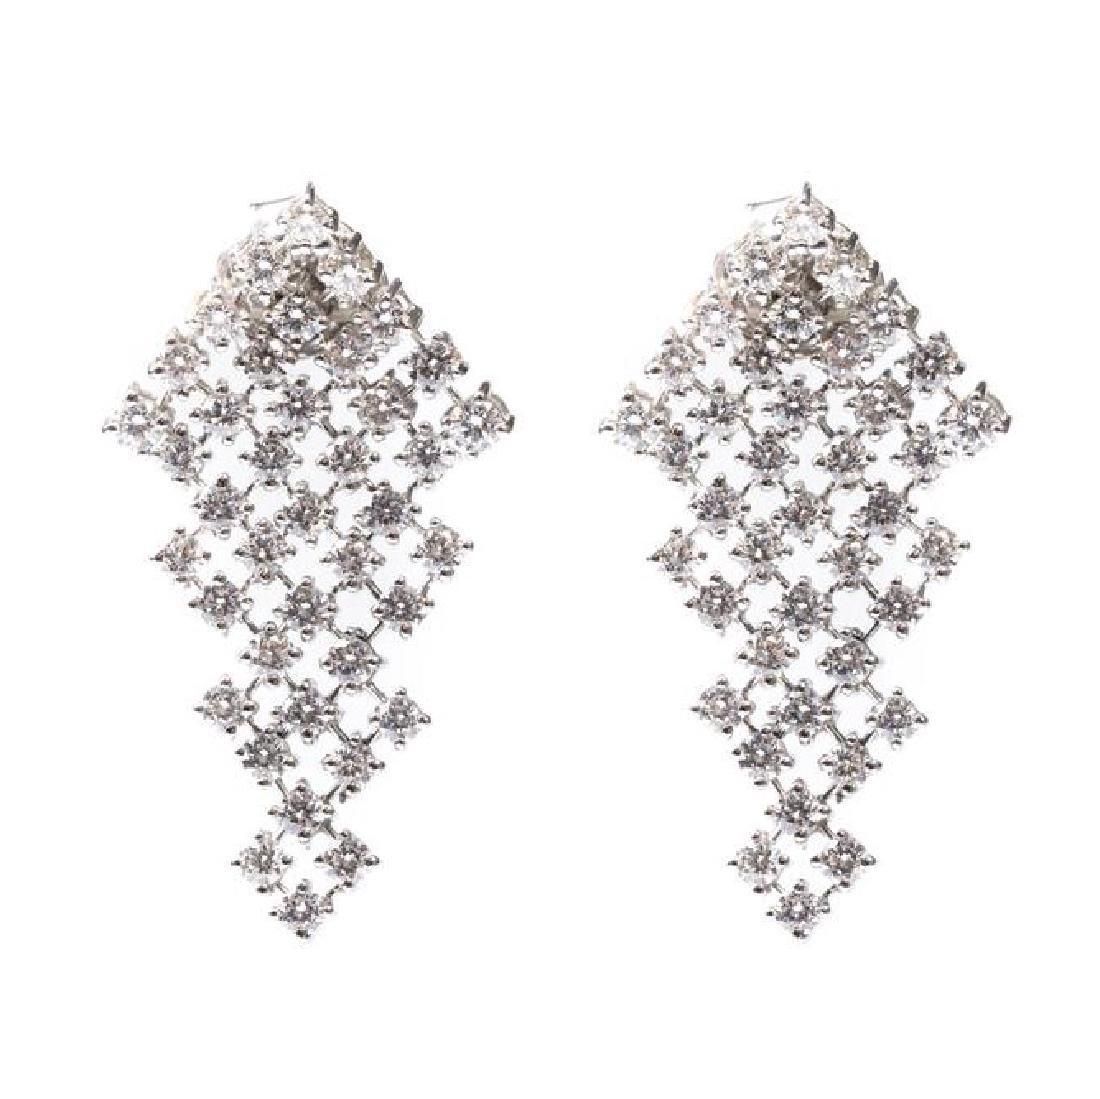 Pair of earrings with diamonds, 21st Century